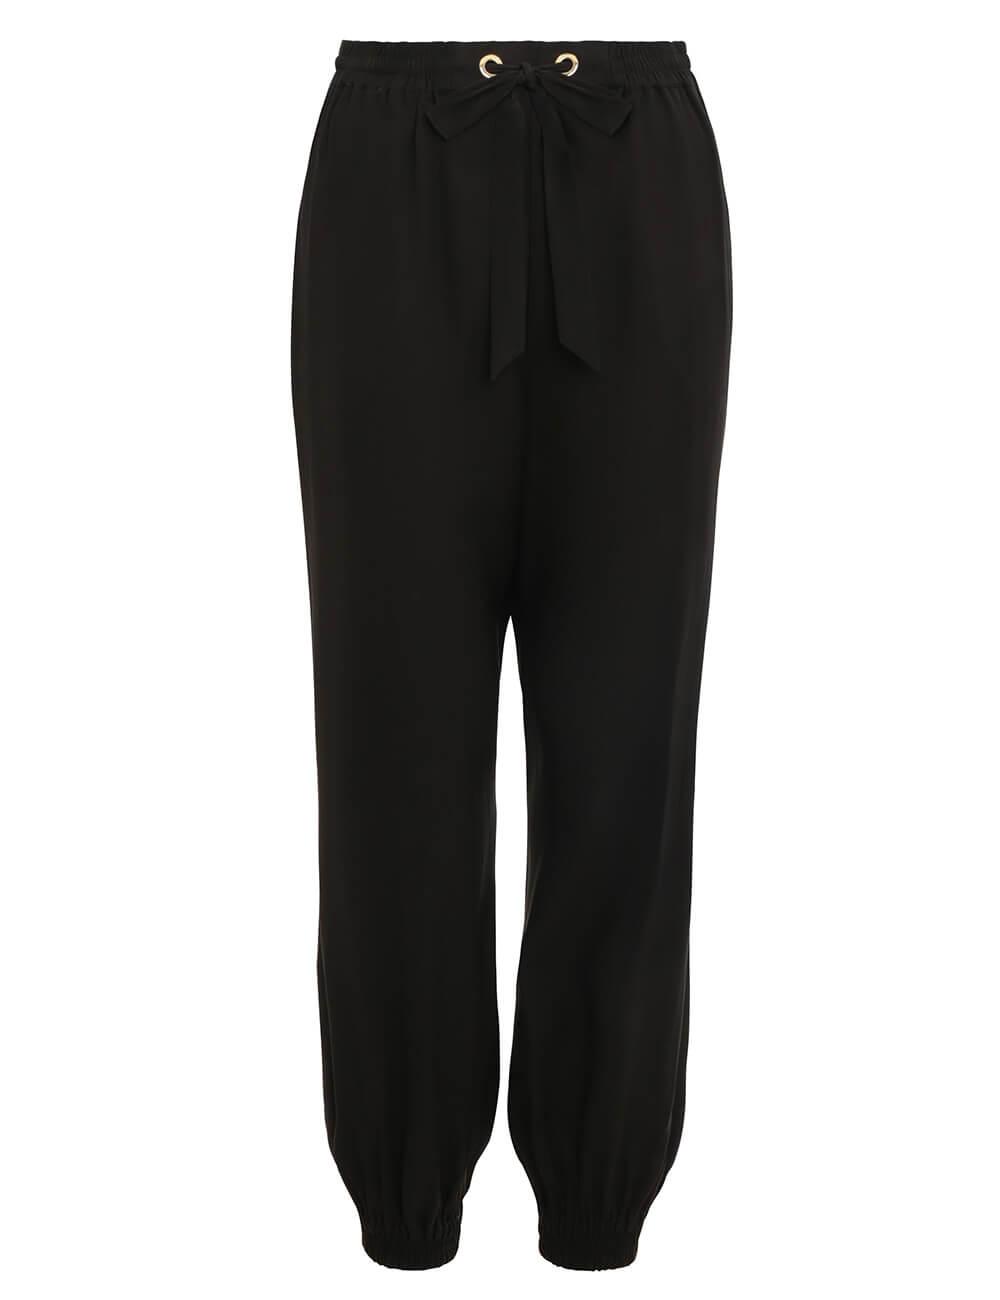 f8987b94dd6b Pants Straight Leg - Pants - Clothing - Ready to Wear